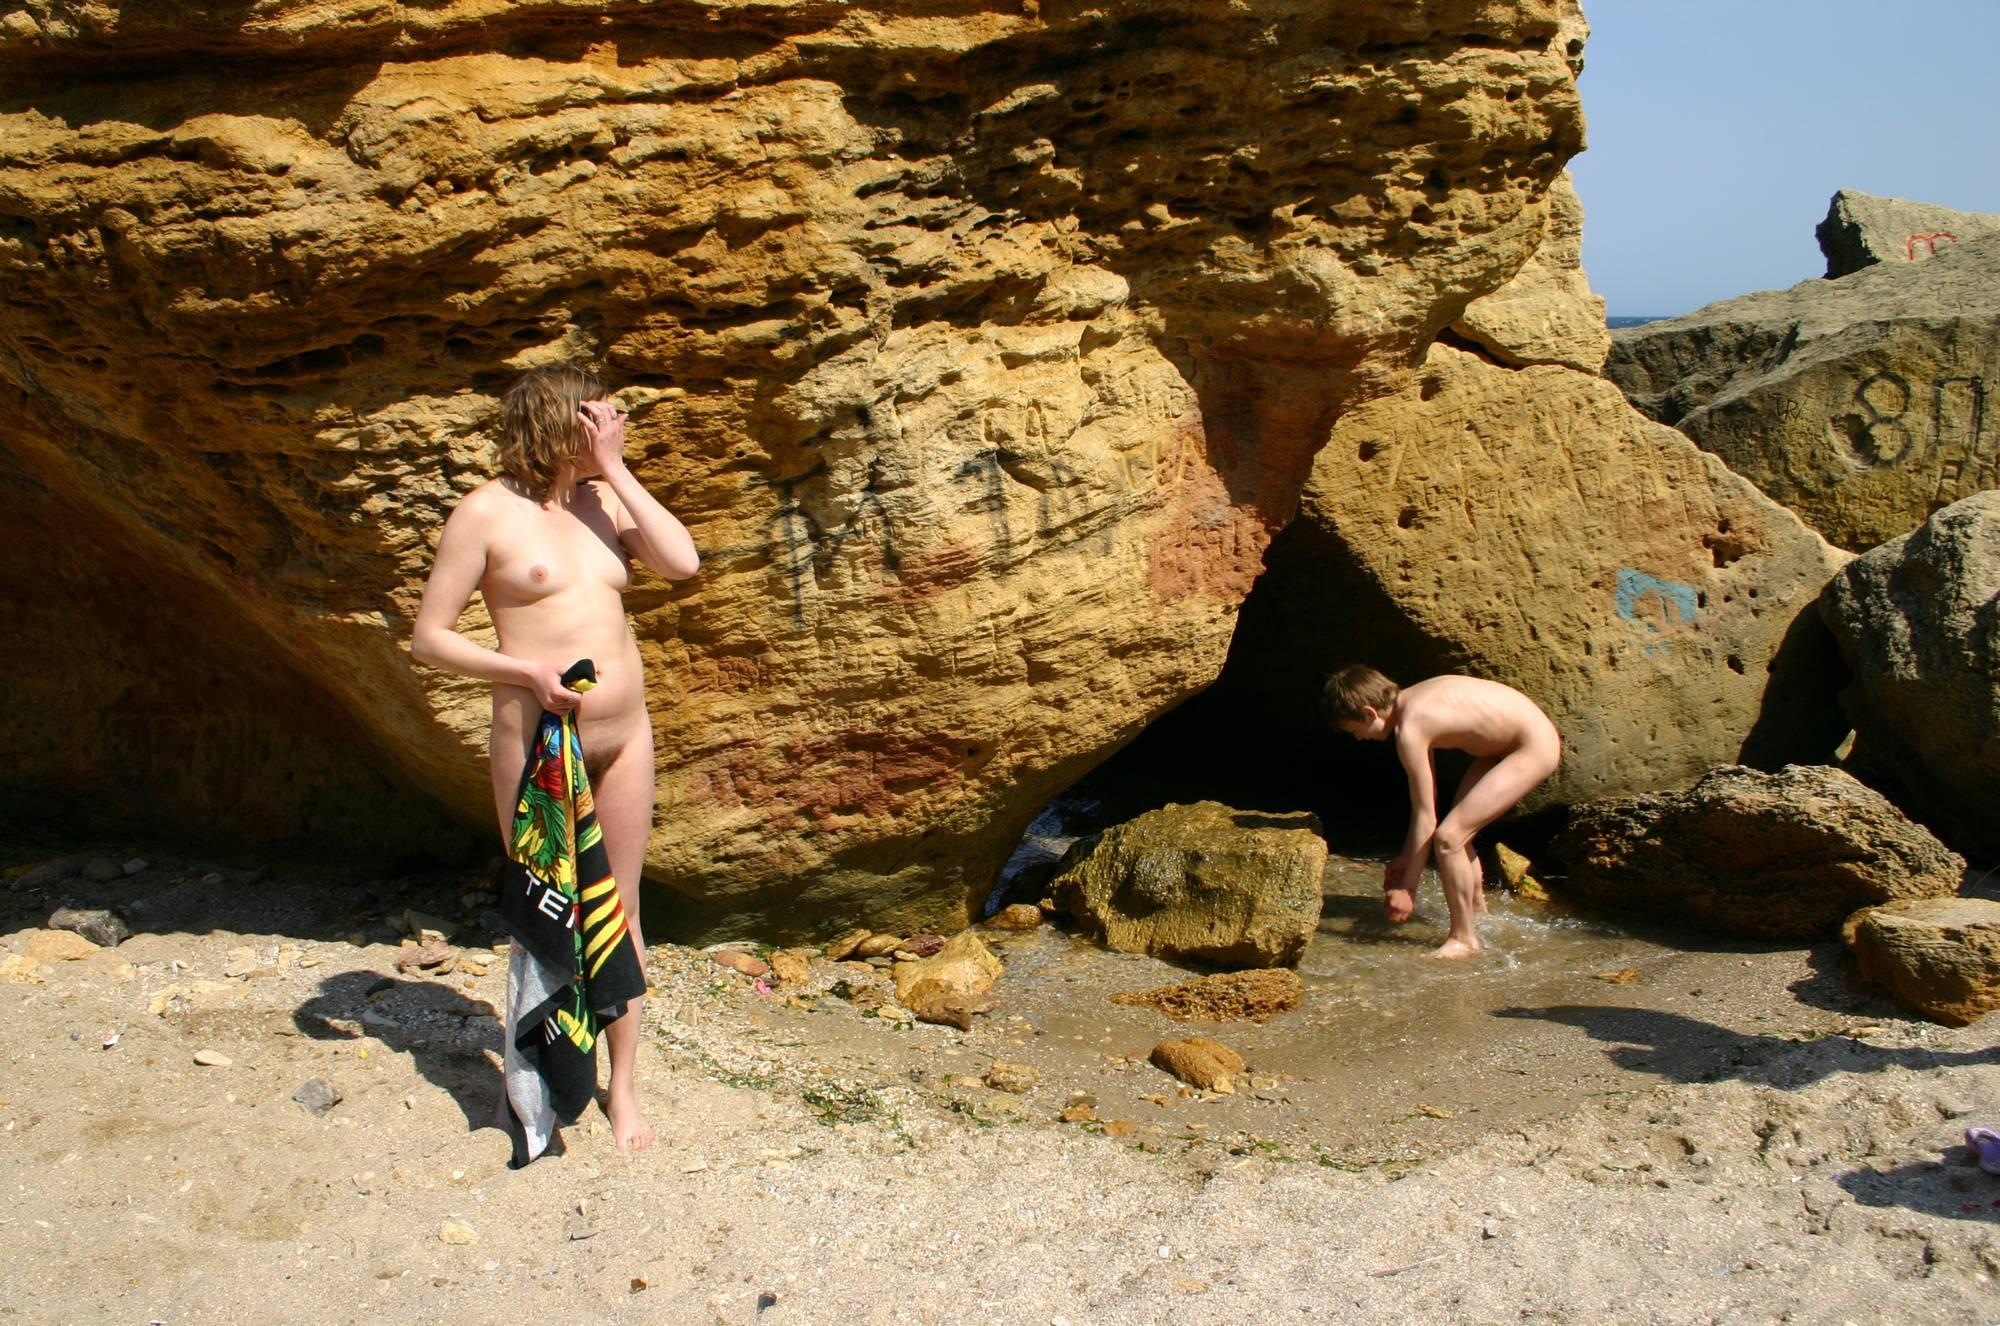 Playing Around the Rocks - 1